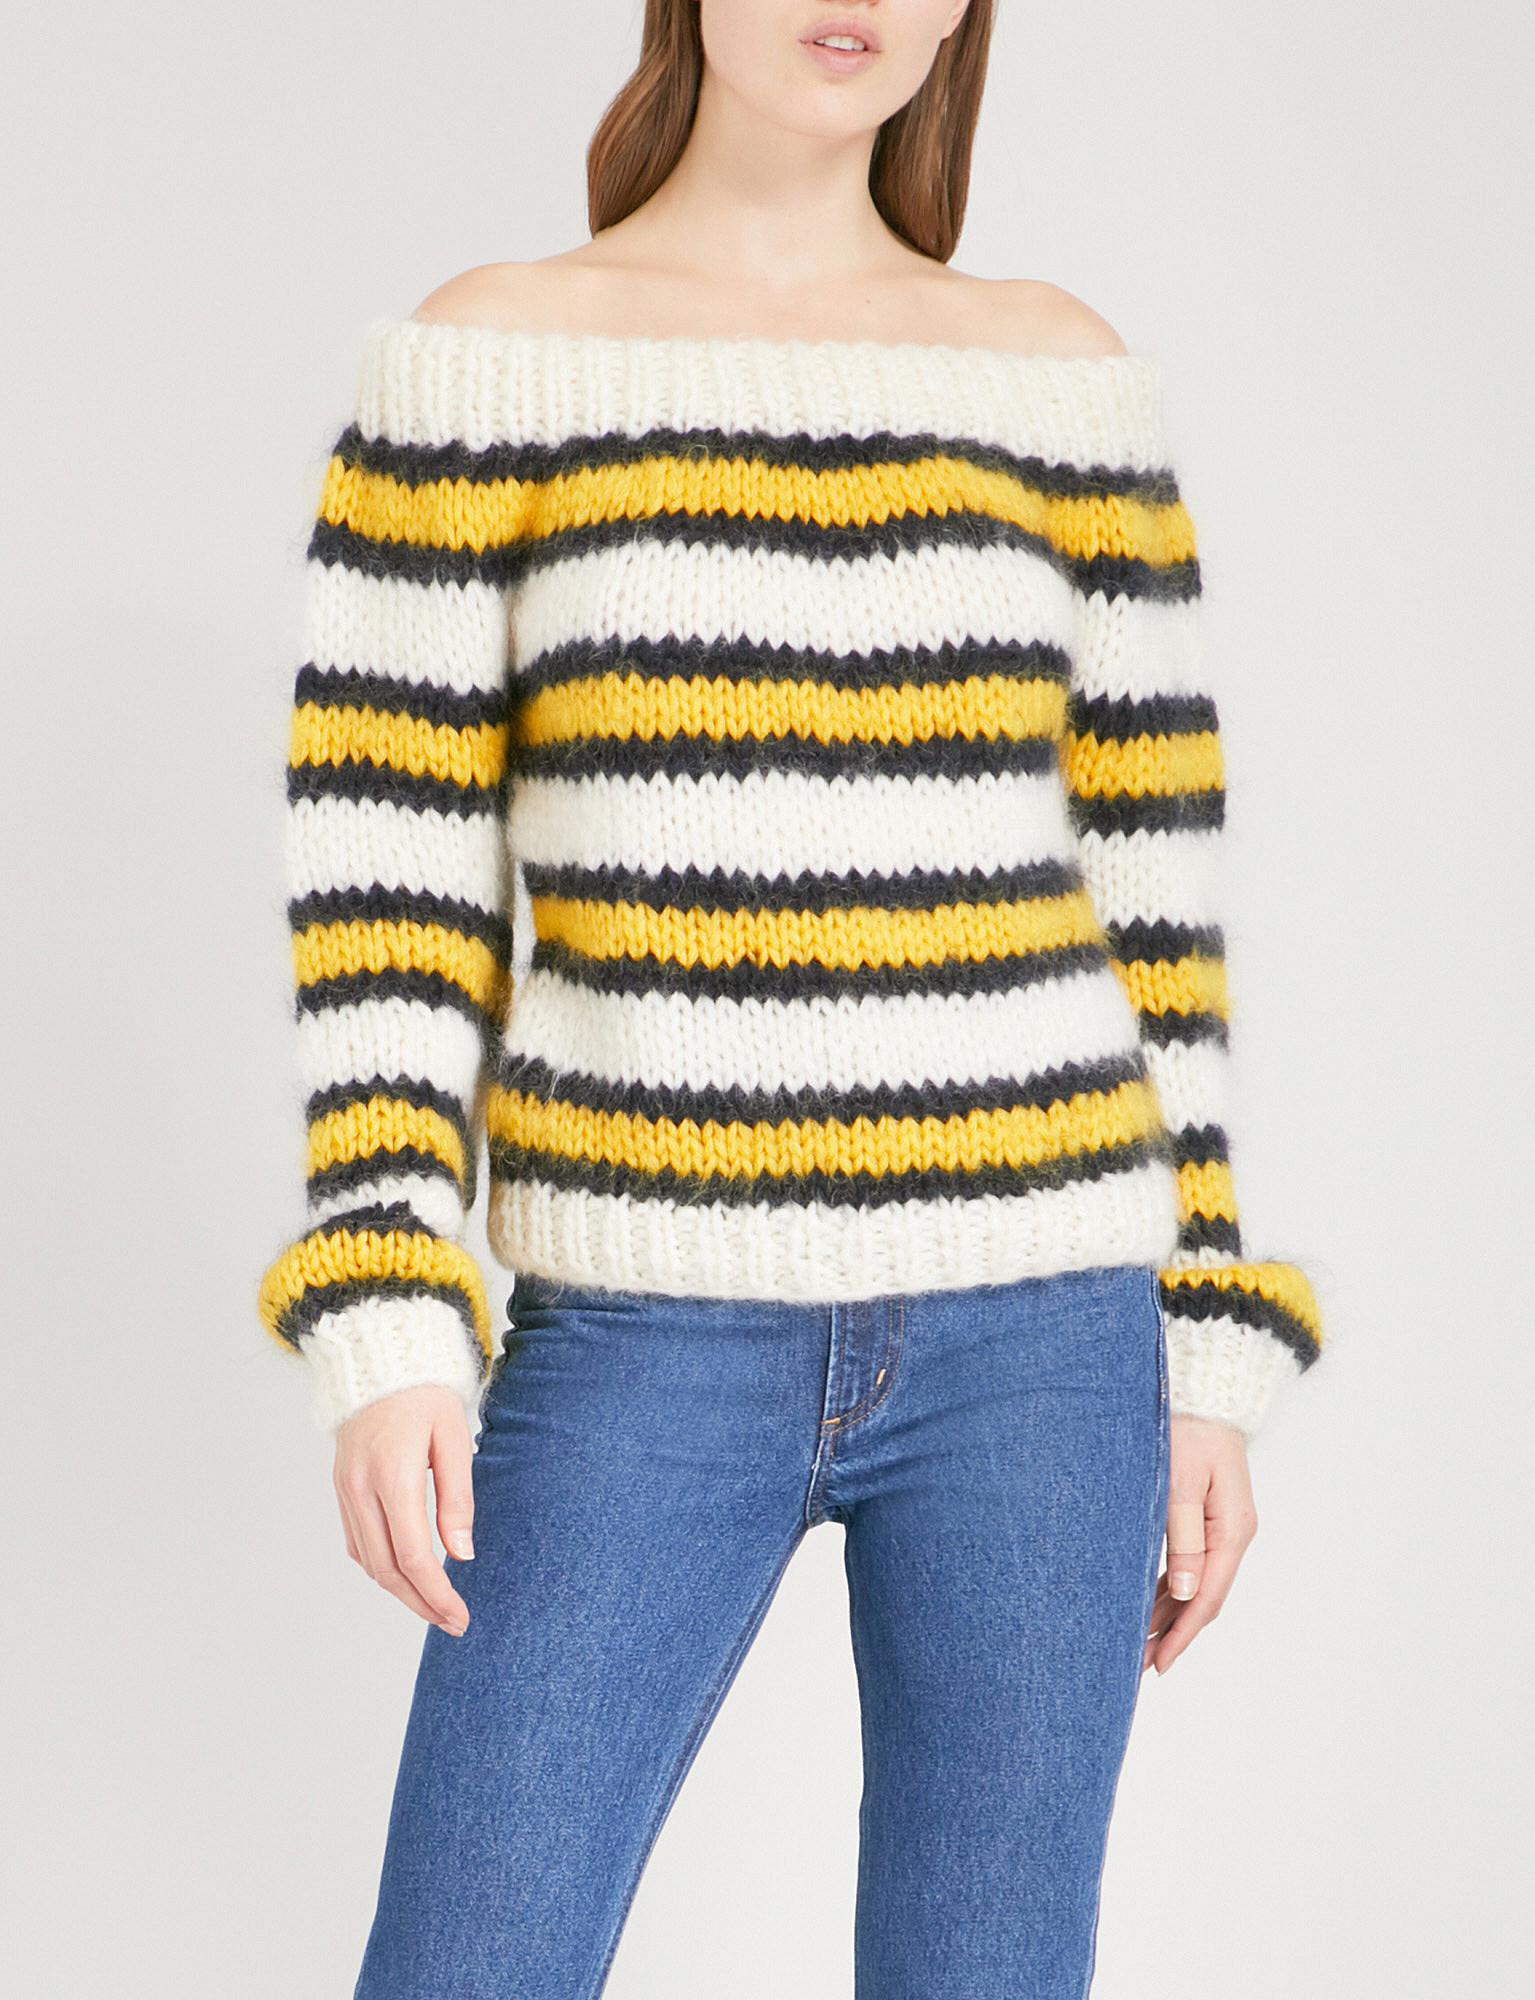 de0349c1a13 Ganni Julliard Striped Wool And Mohair-blend Jumper in Yellow - Lyst